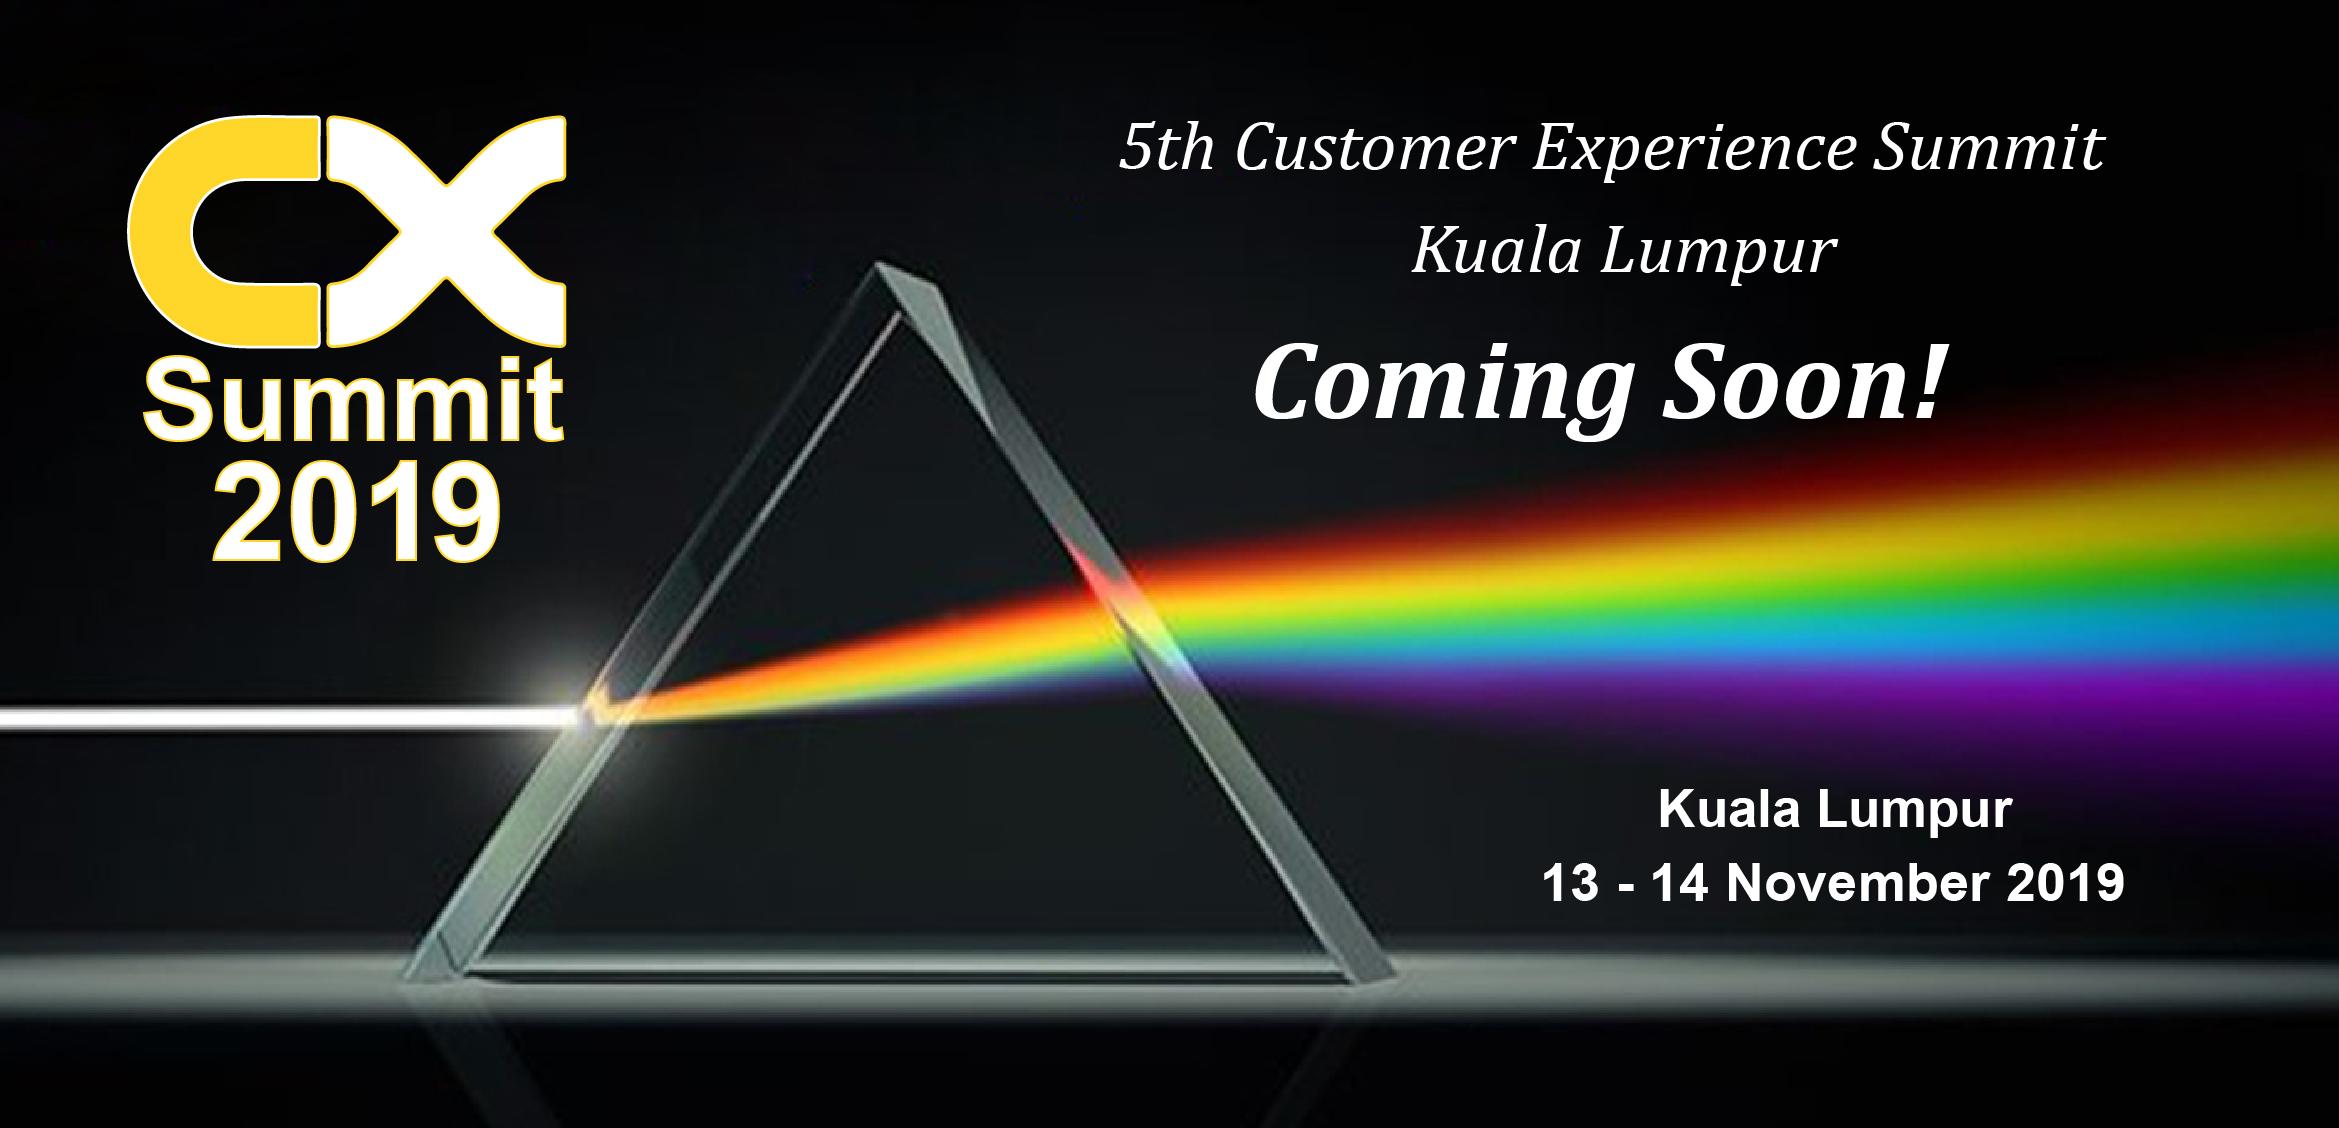 Customer Experience Summit 2019